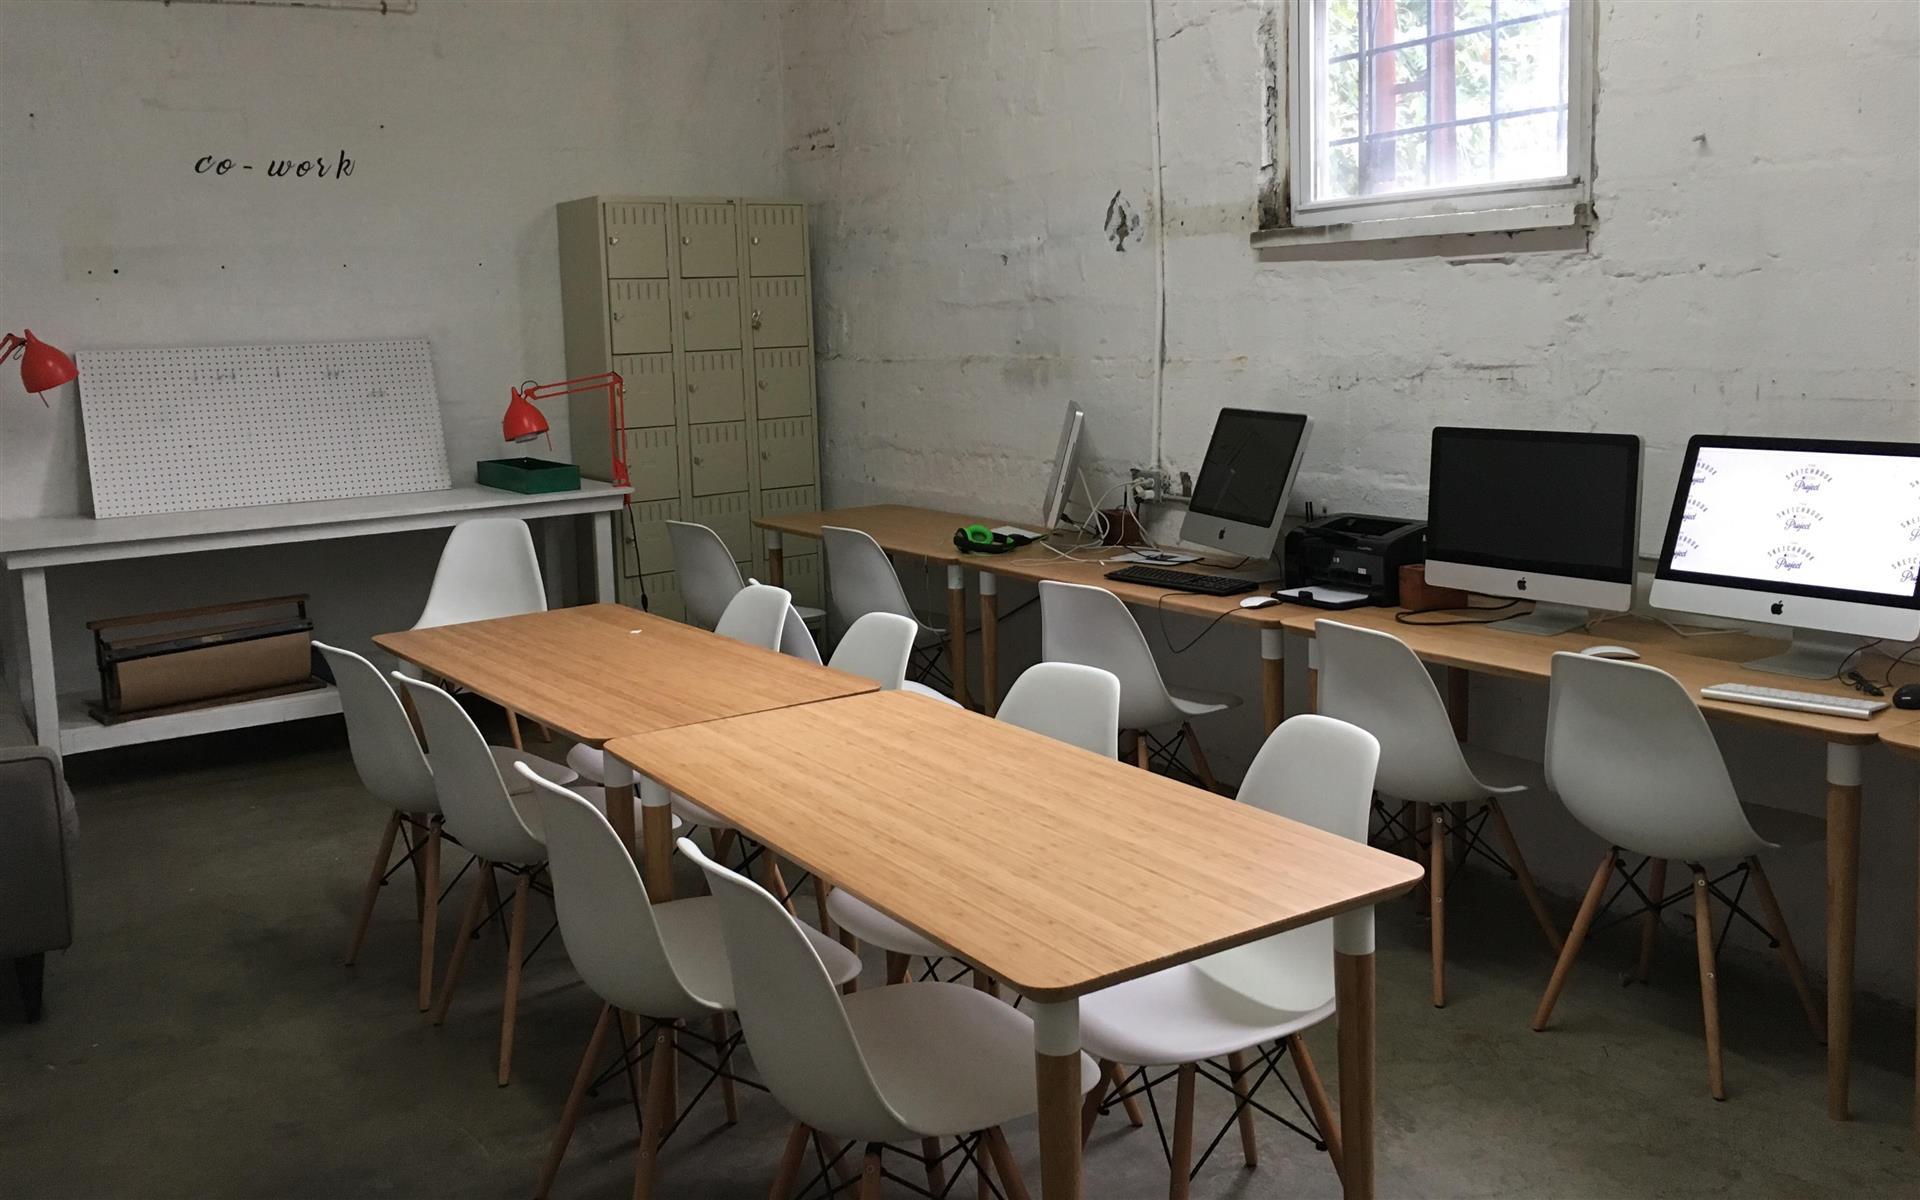 Brooklyn Art Library - Team Office Space in Sketchbook Library